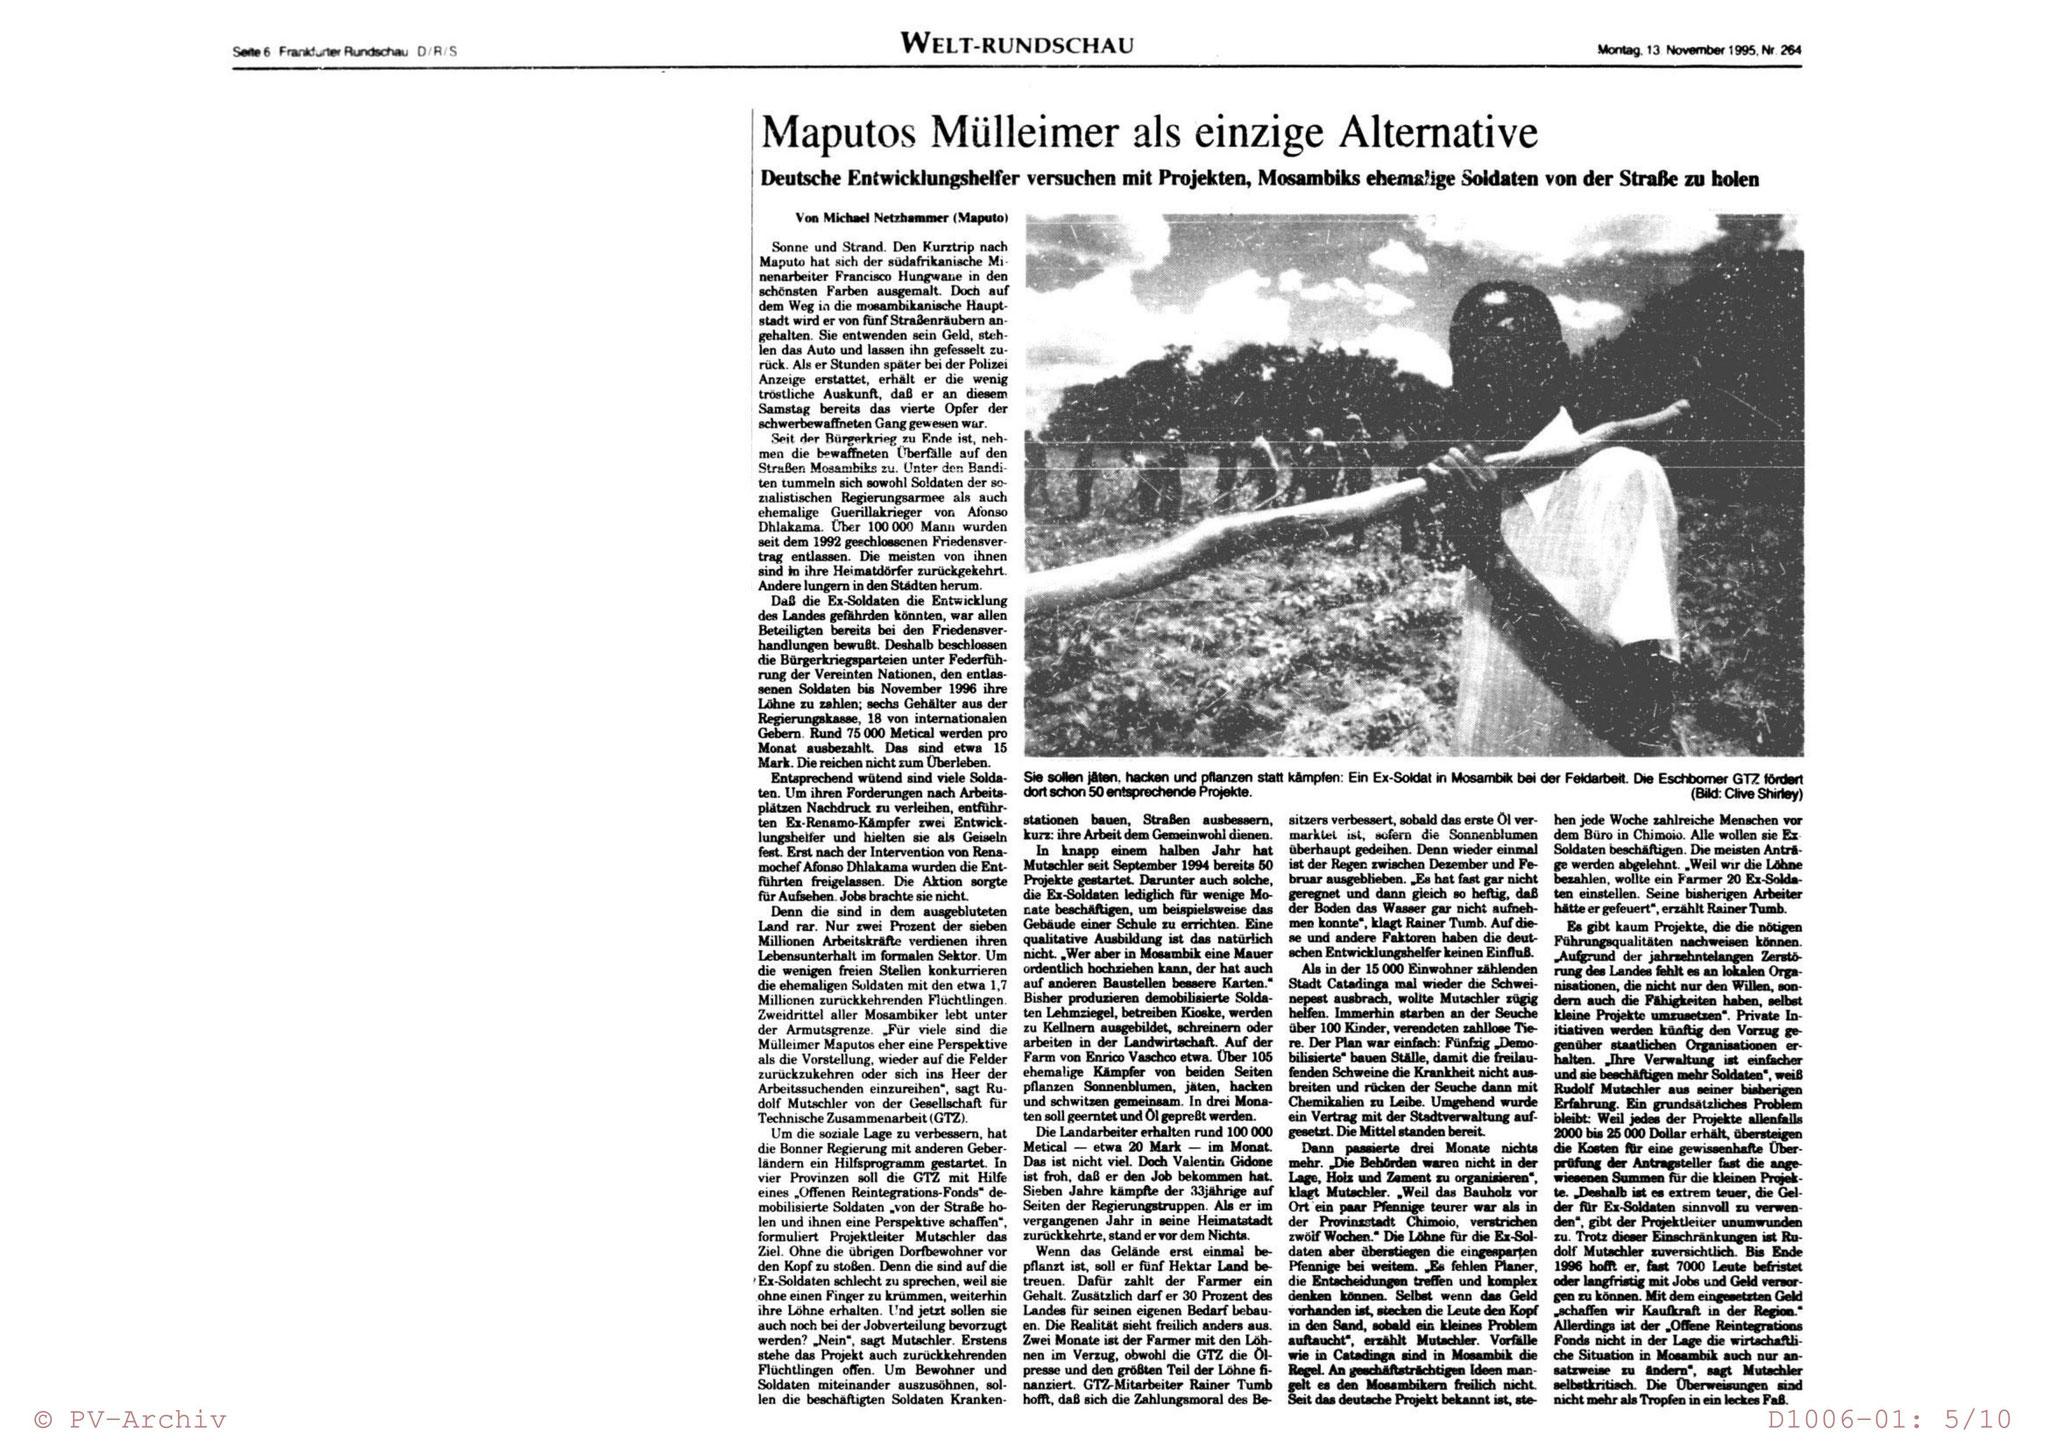 Frankfurter Rundschau 13.11.1995